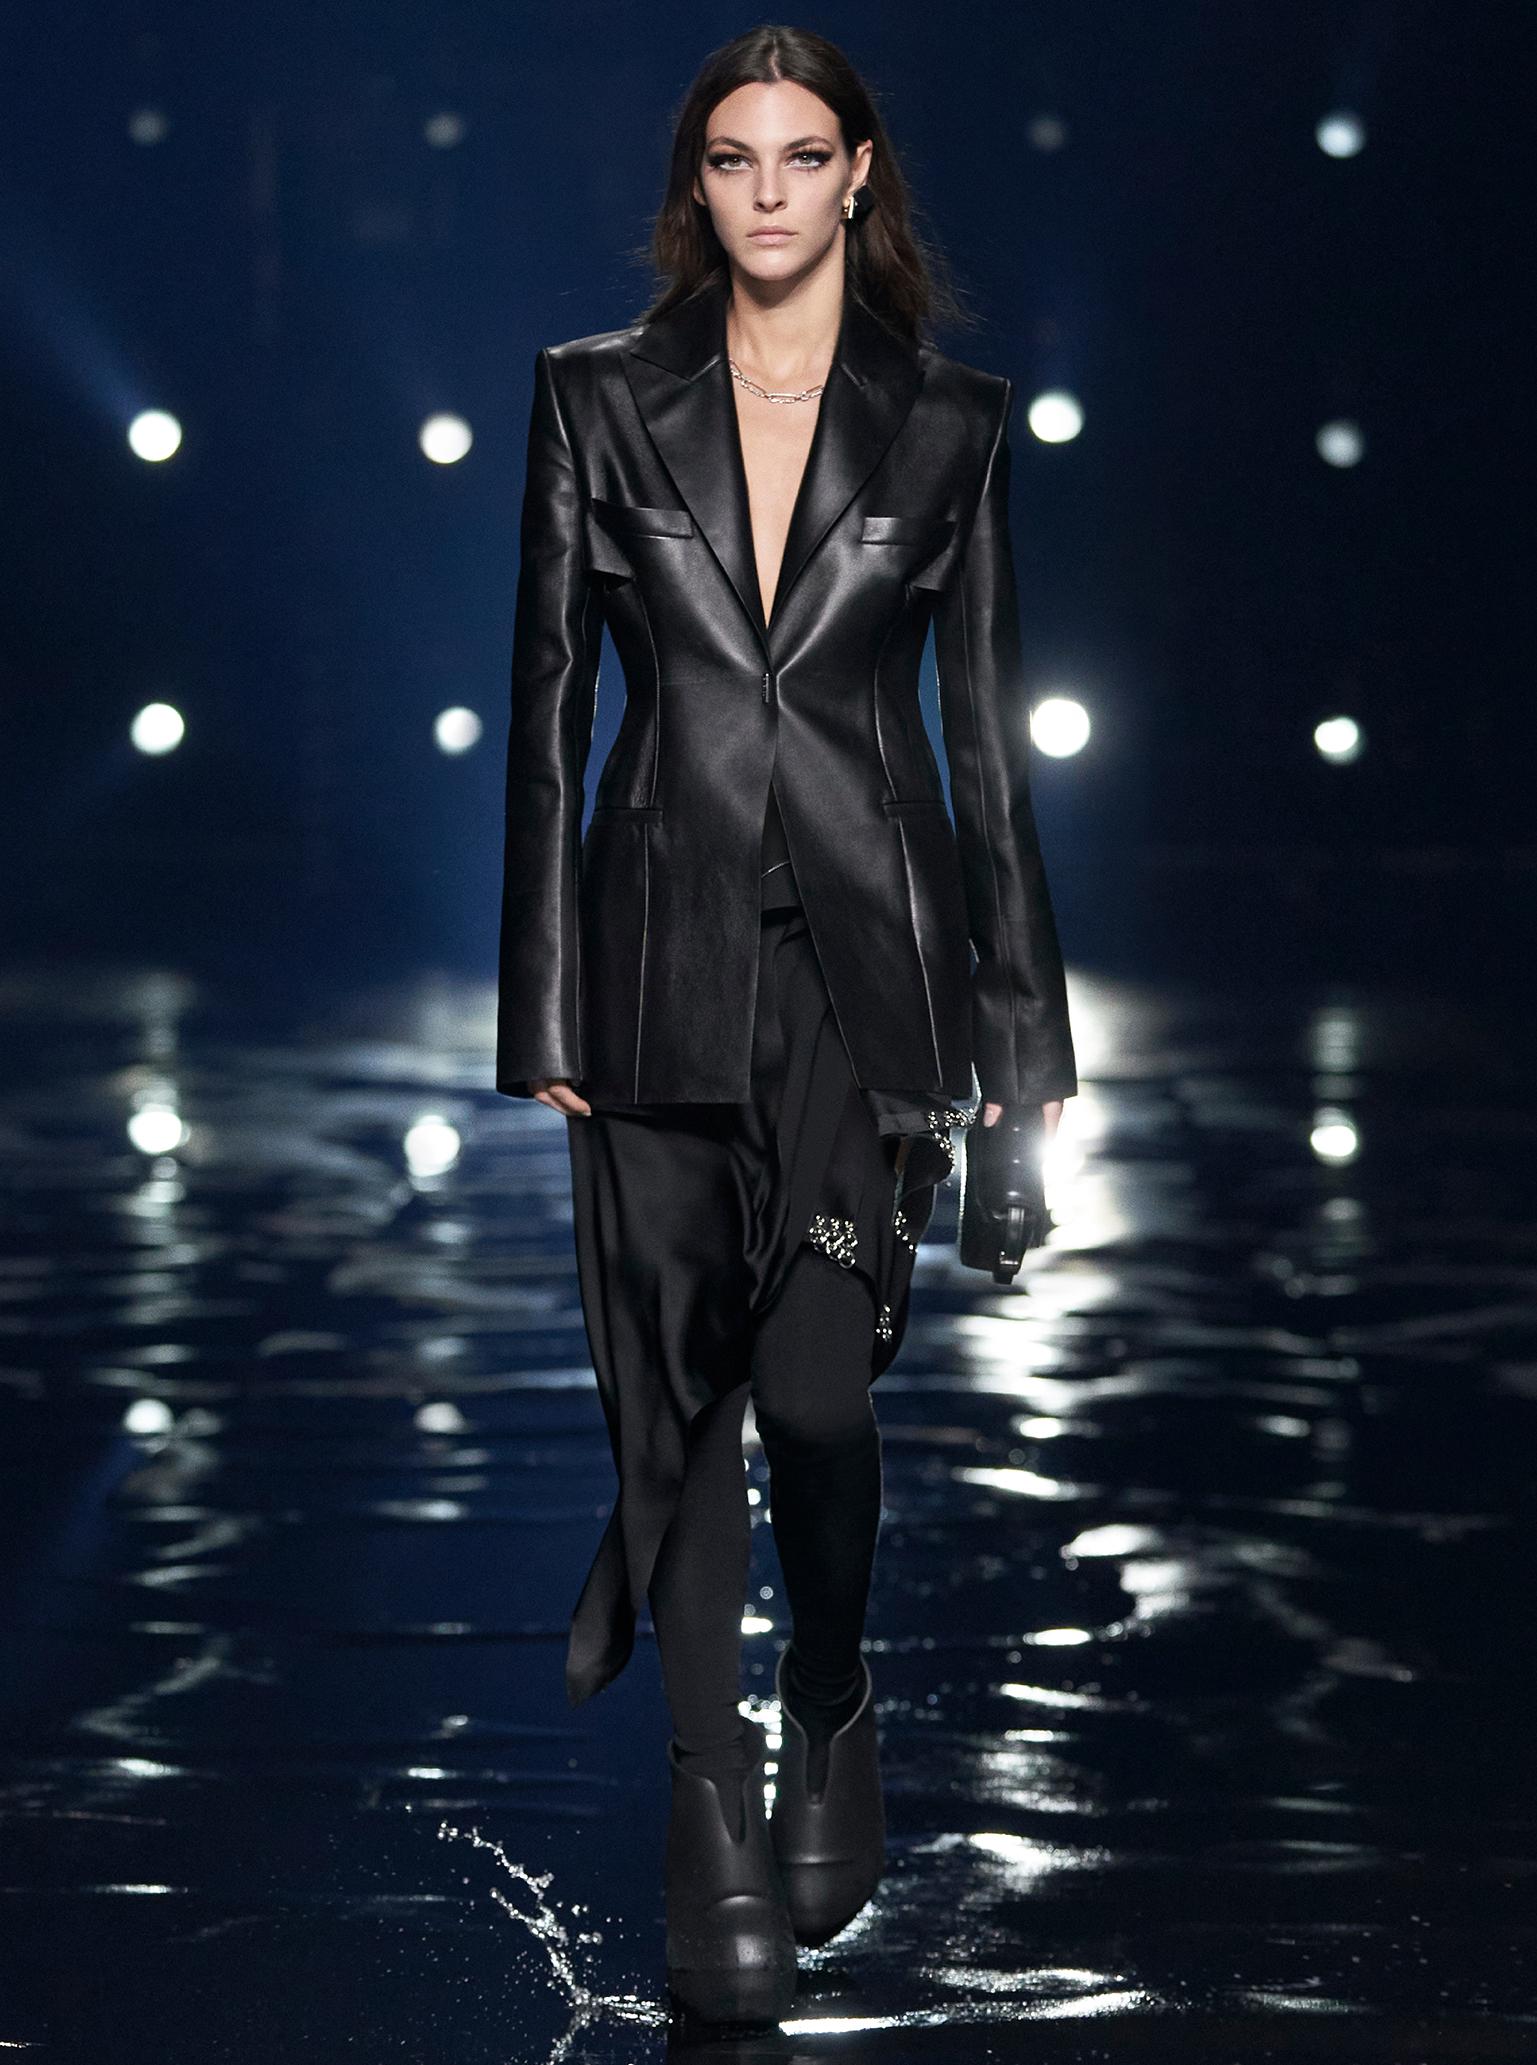 Givenchy Paris Fashion Week 2021 Women black leather tailoring